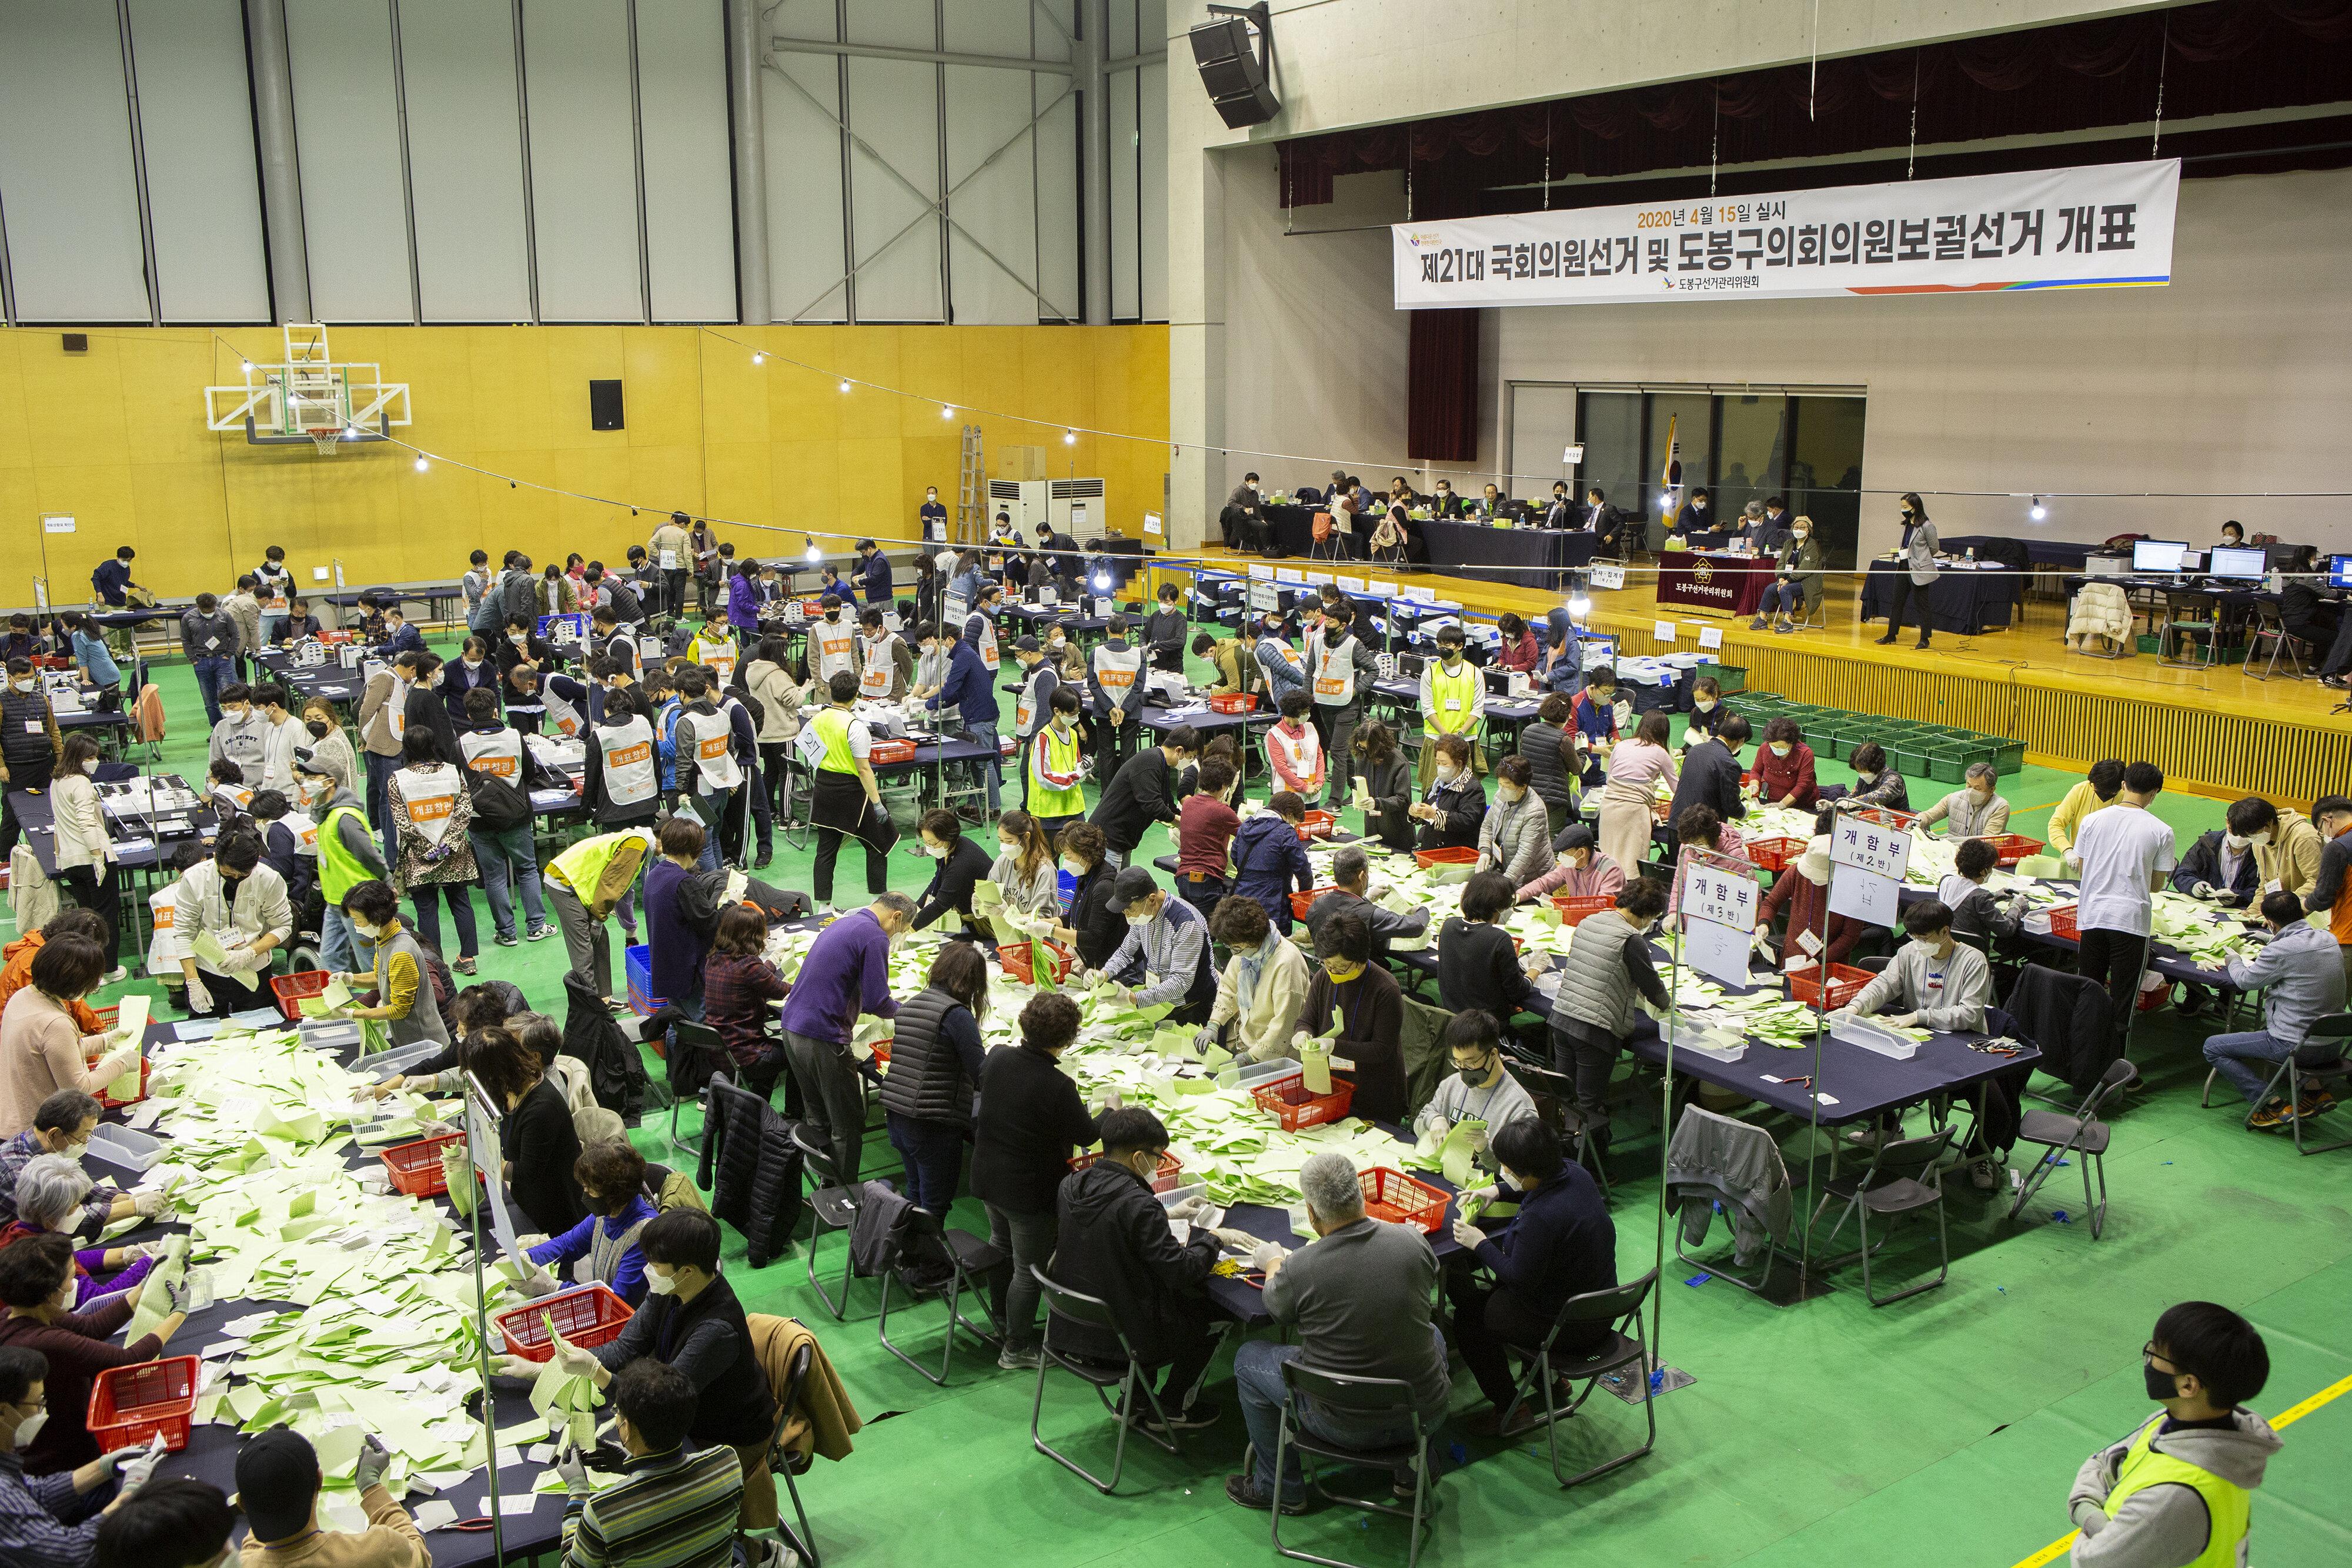 South Korea holds parliamentary elections amid coronavirus outbreak